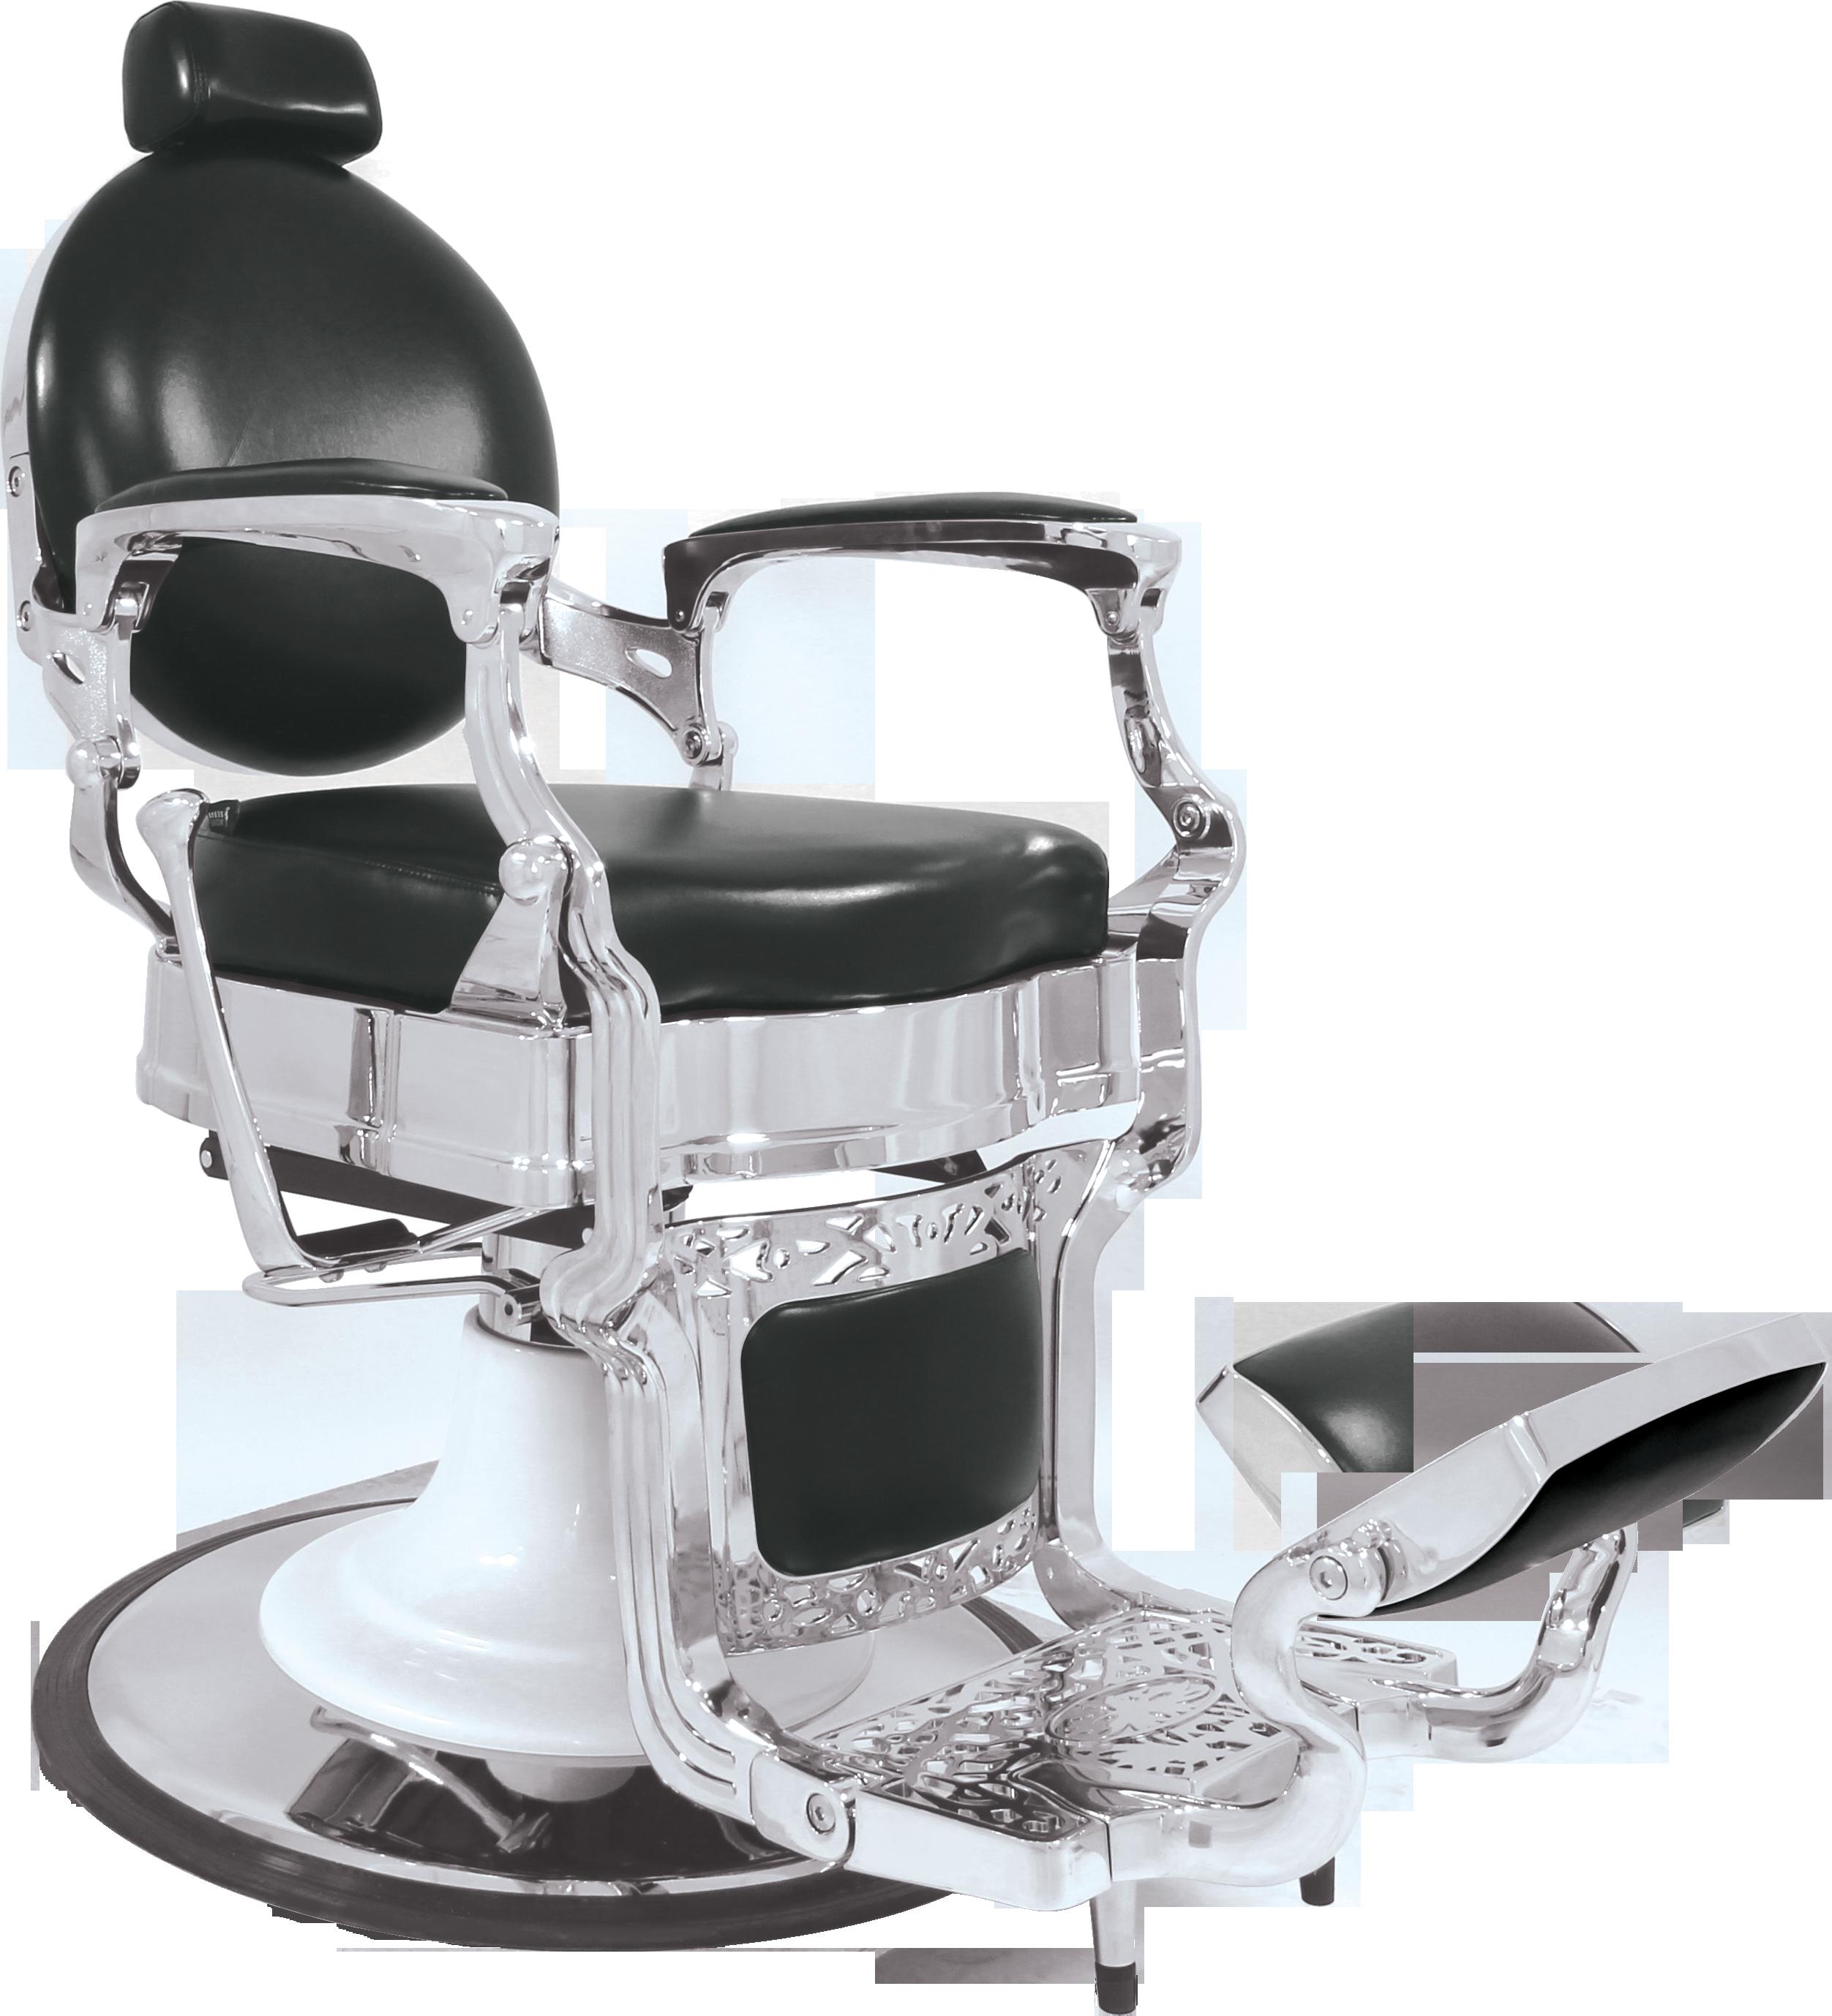 Silla De Pelo Para El Salon De Pelo Silla De Barbero De Un Multi Funcional De Alta Clase Silla De M Barber Chair Commercial Furniture Beach Chair With Canopy